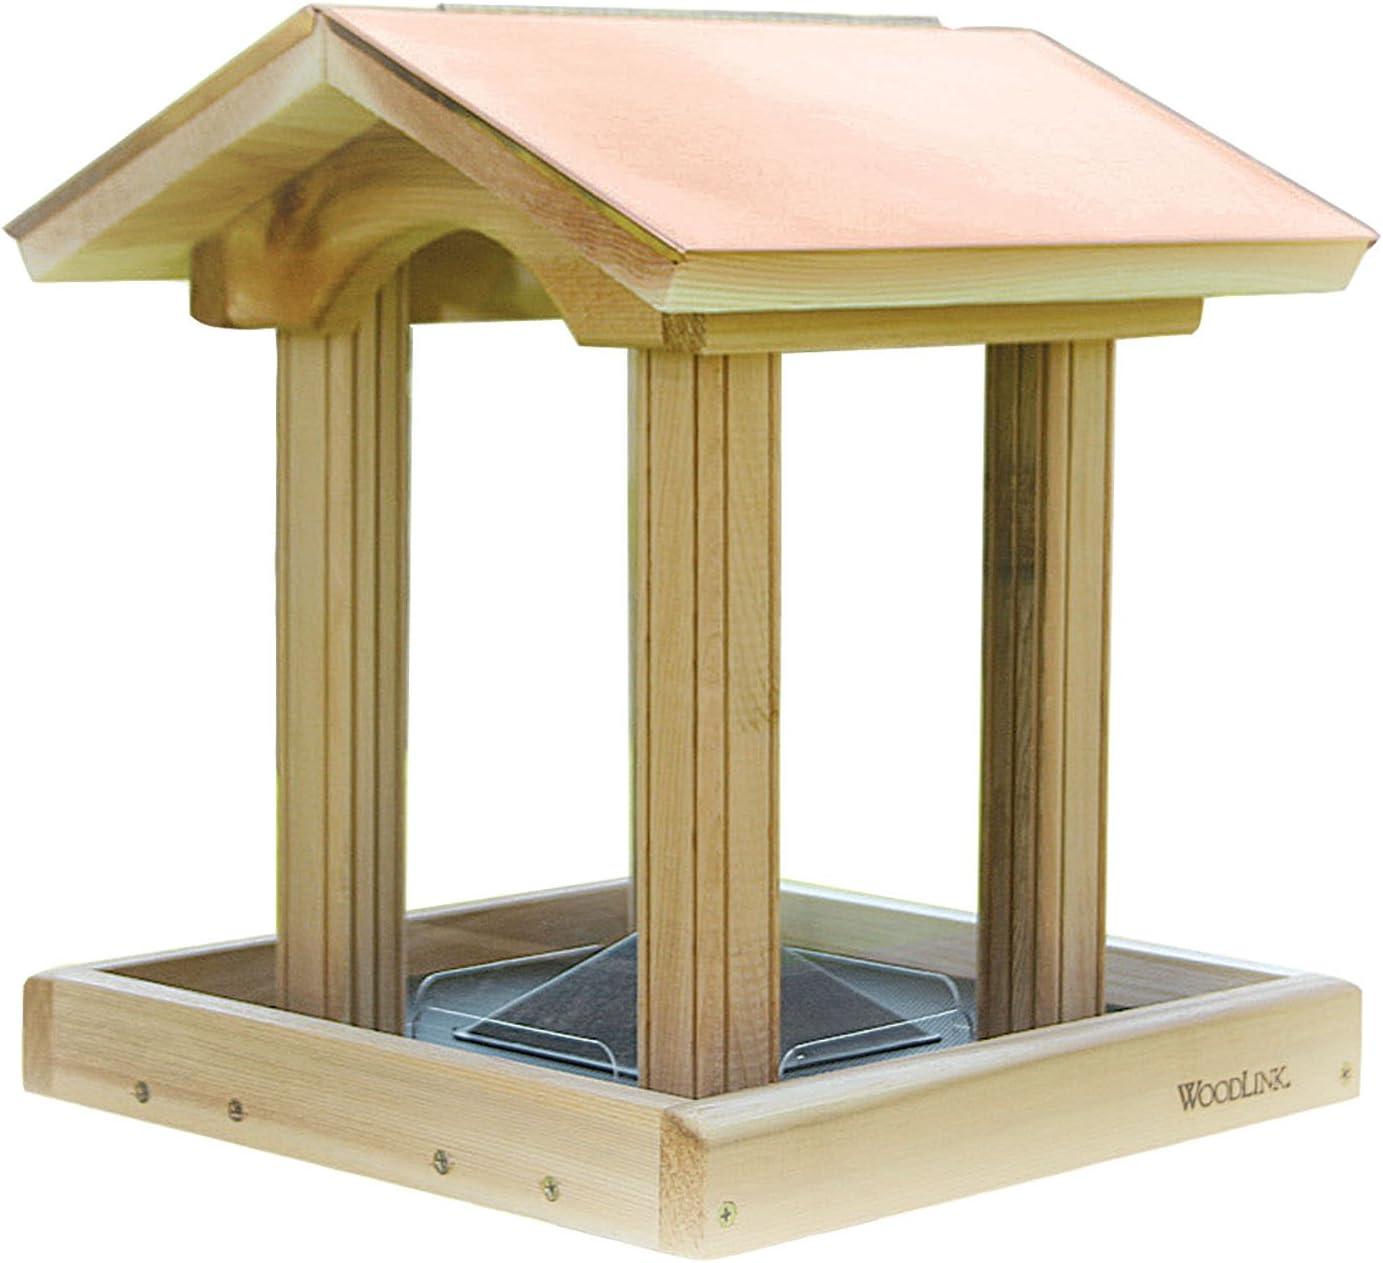 Woodlink Coppertop Hopper Bird Feeder